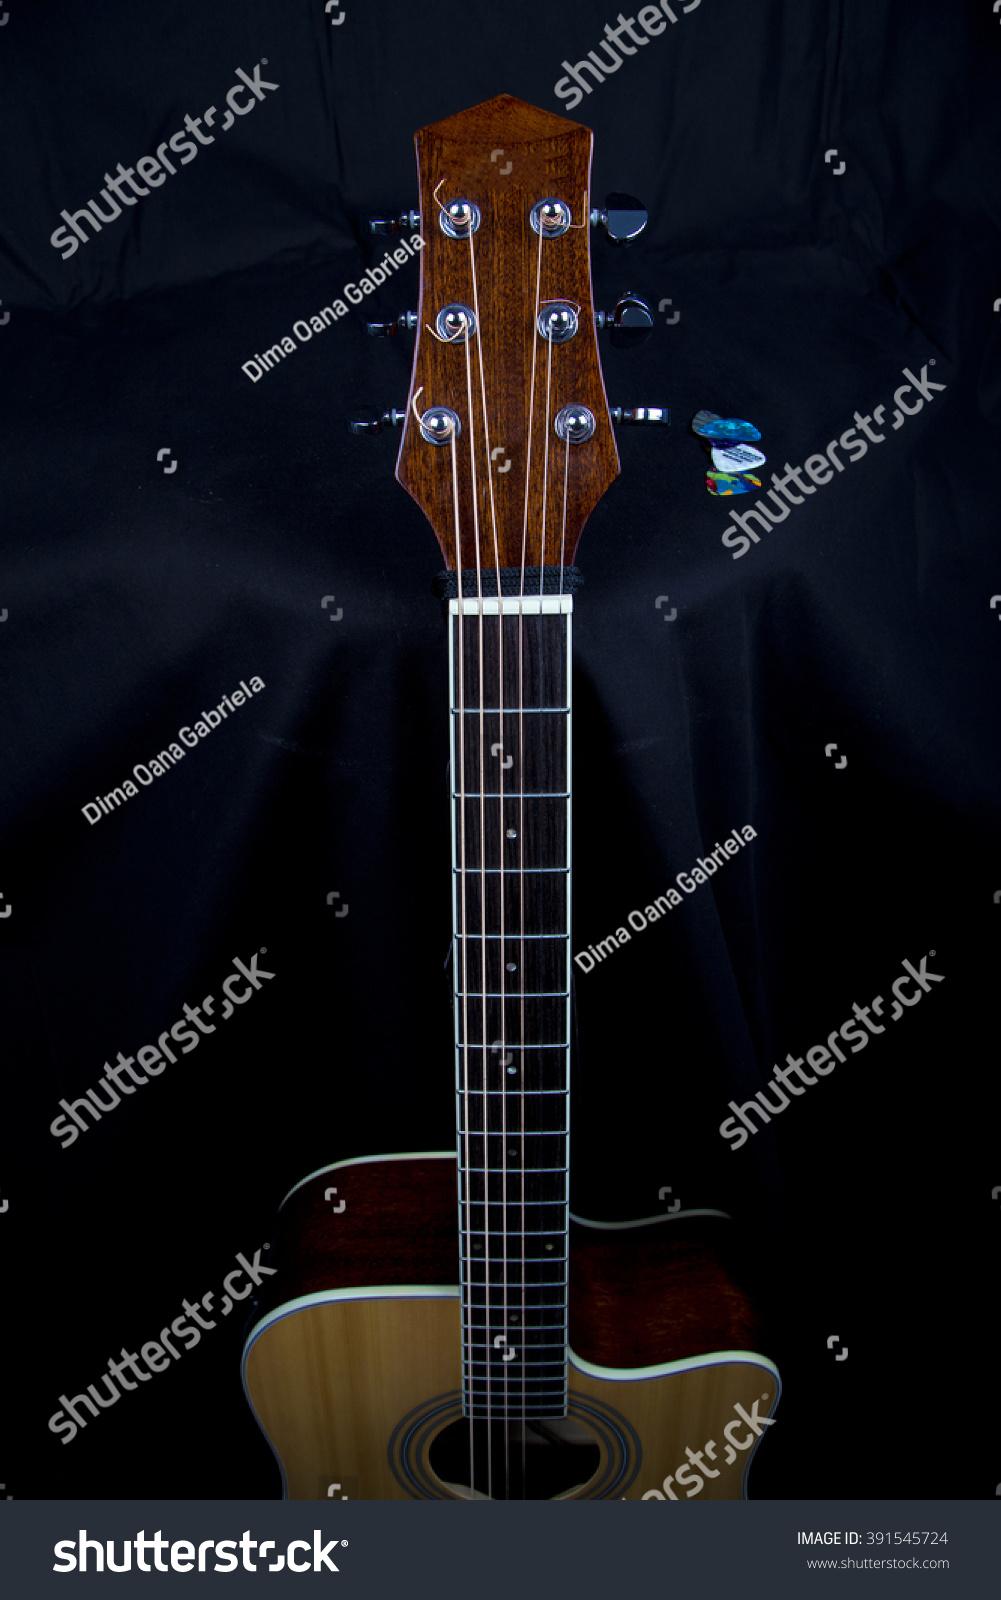 Guitar Fingerboard Electric Parts Acoustic Musical Stock Fingerboardelectric Music Instrument Background